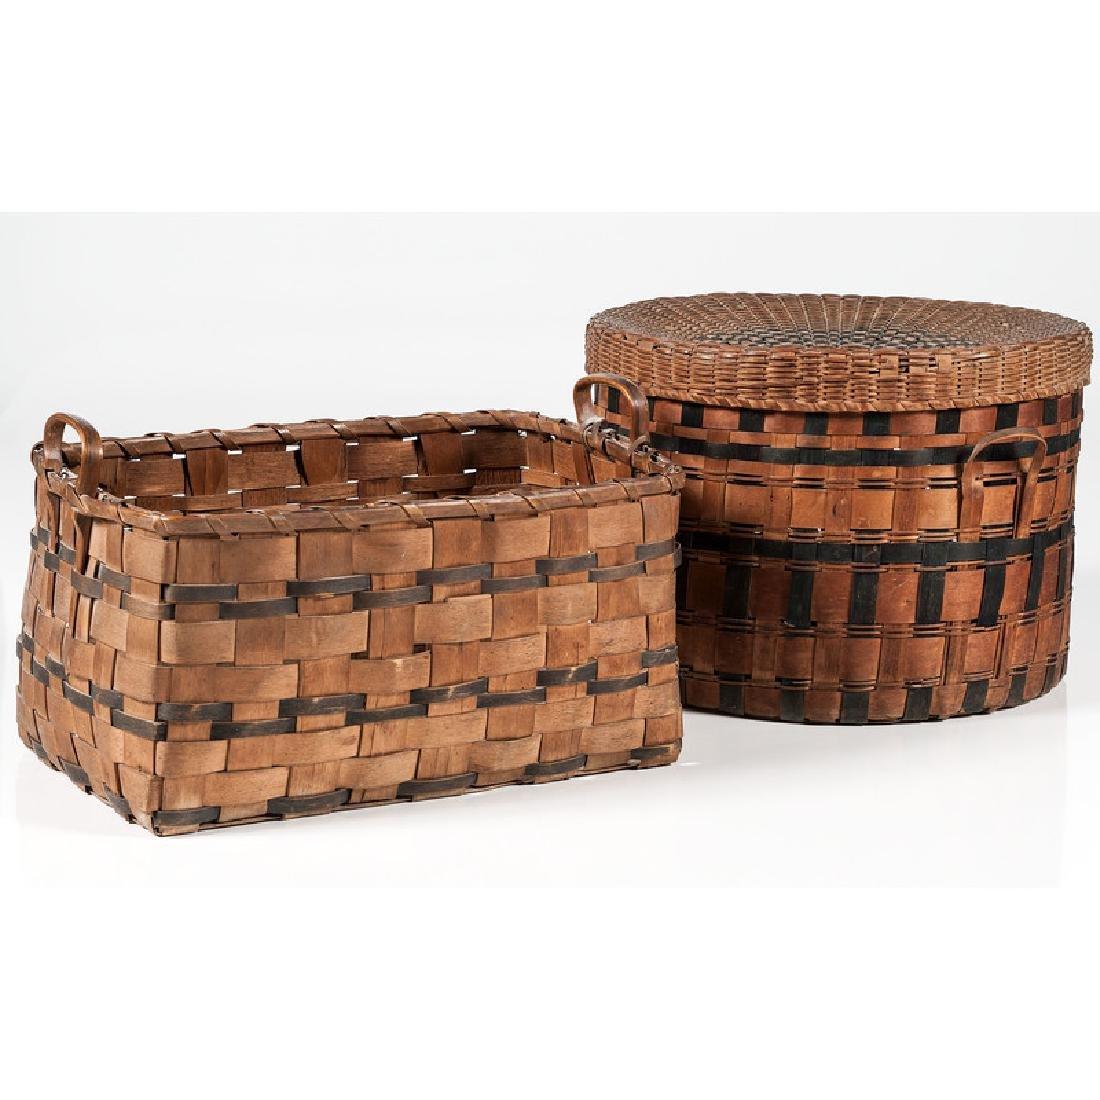 Polychrome Woven Baskets